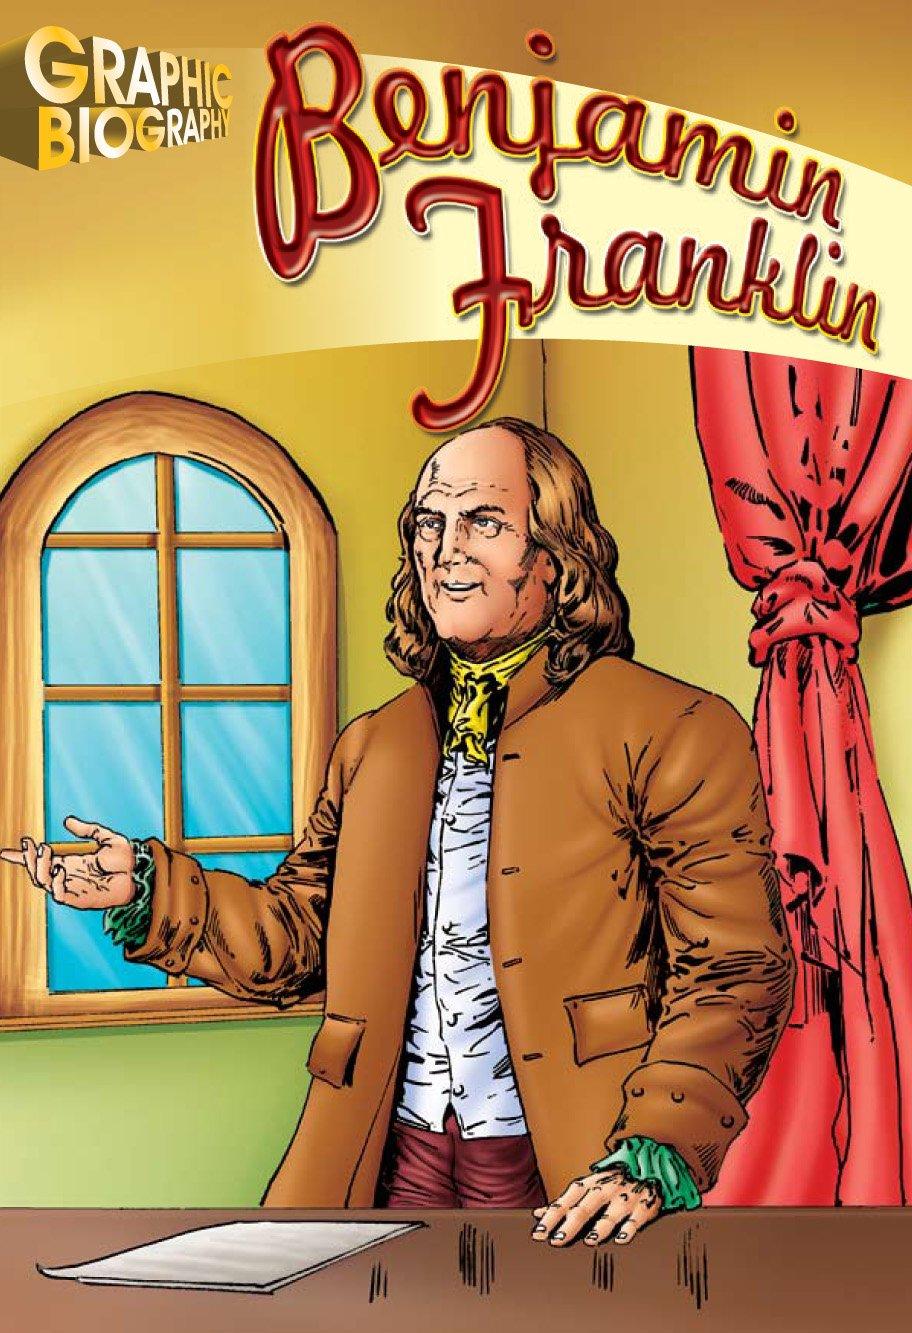 Benjamin Franklin, Graphic Biography (Saddleback Graphic: Biographies) pdf epub